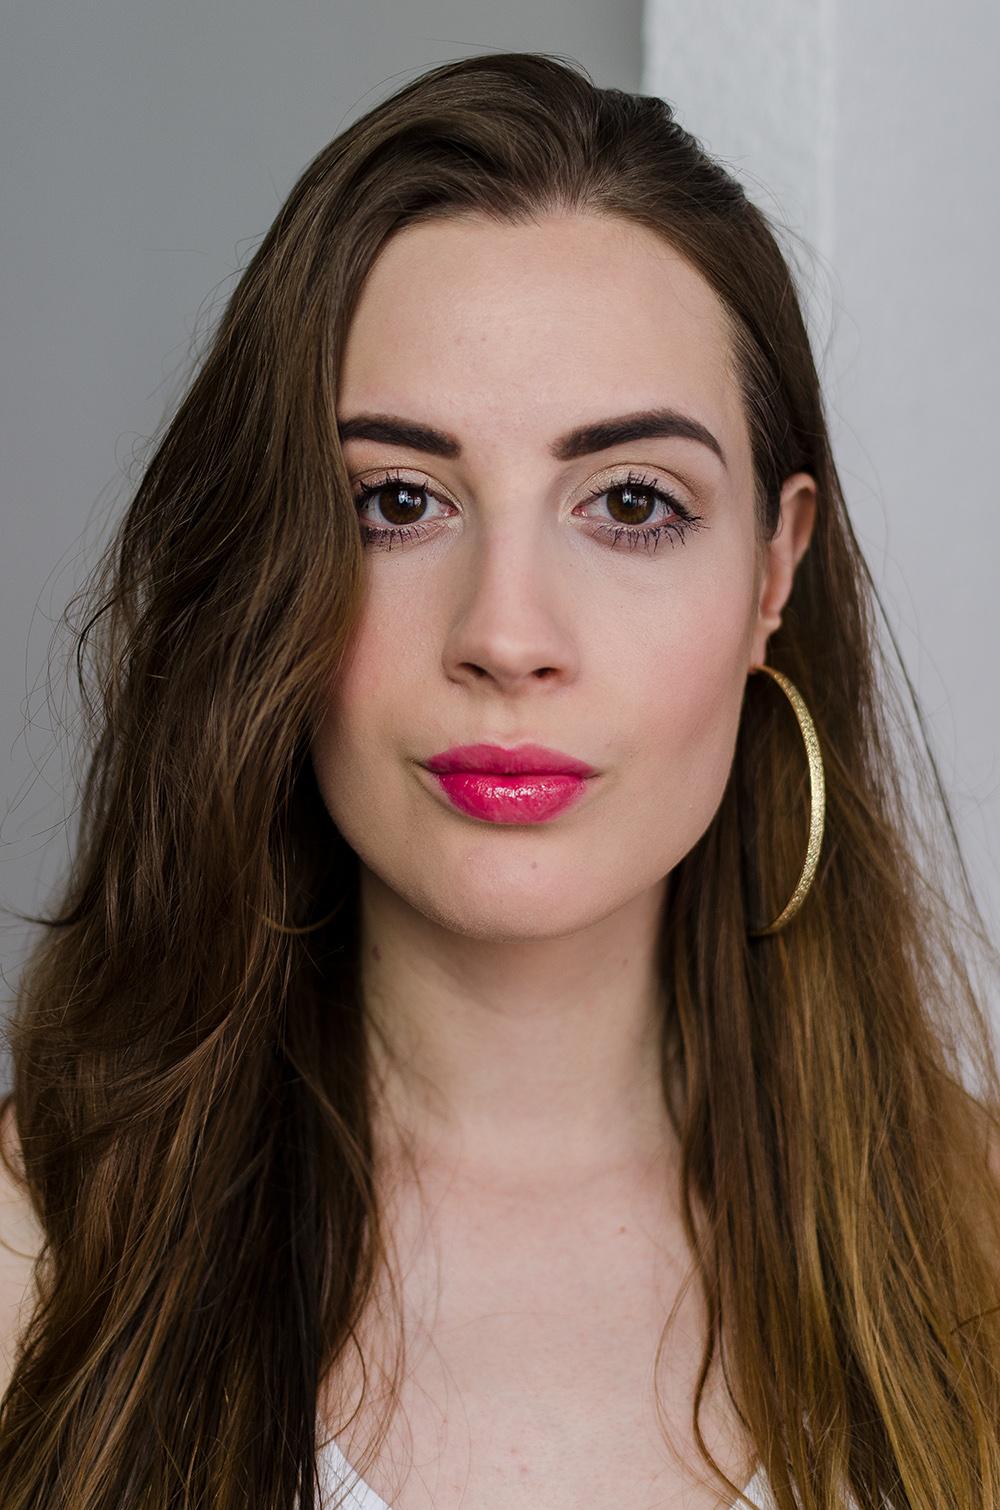 andysparkles-Beauty-5 Minuten Alltags Make-Up